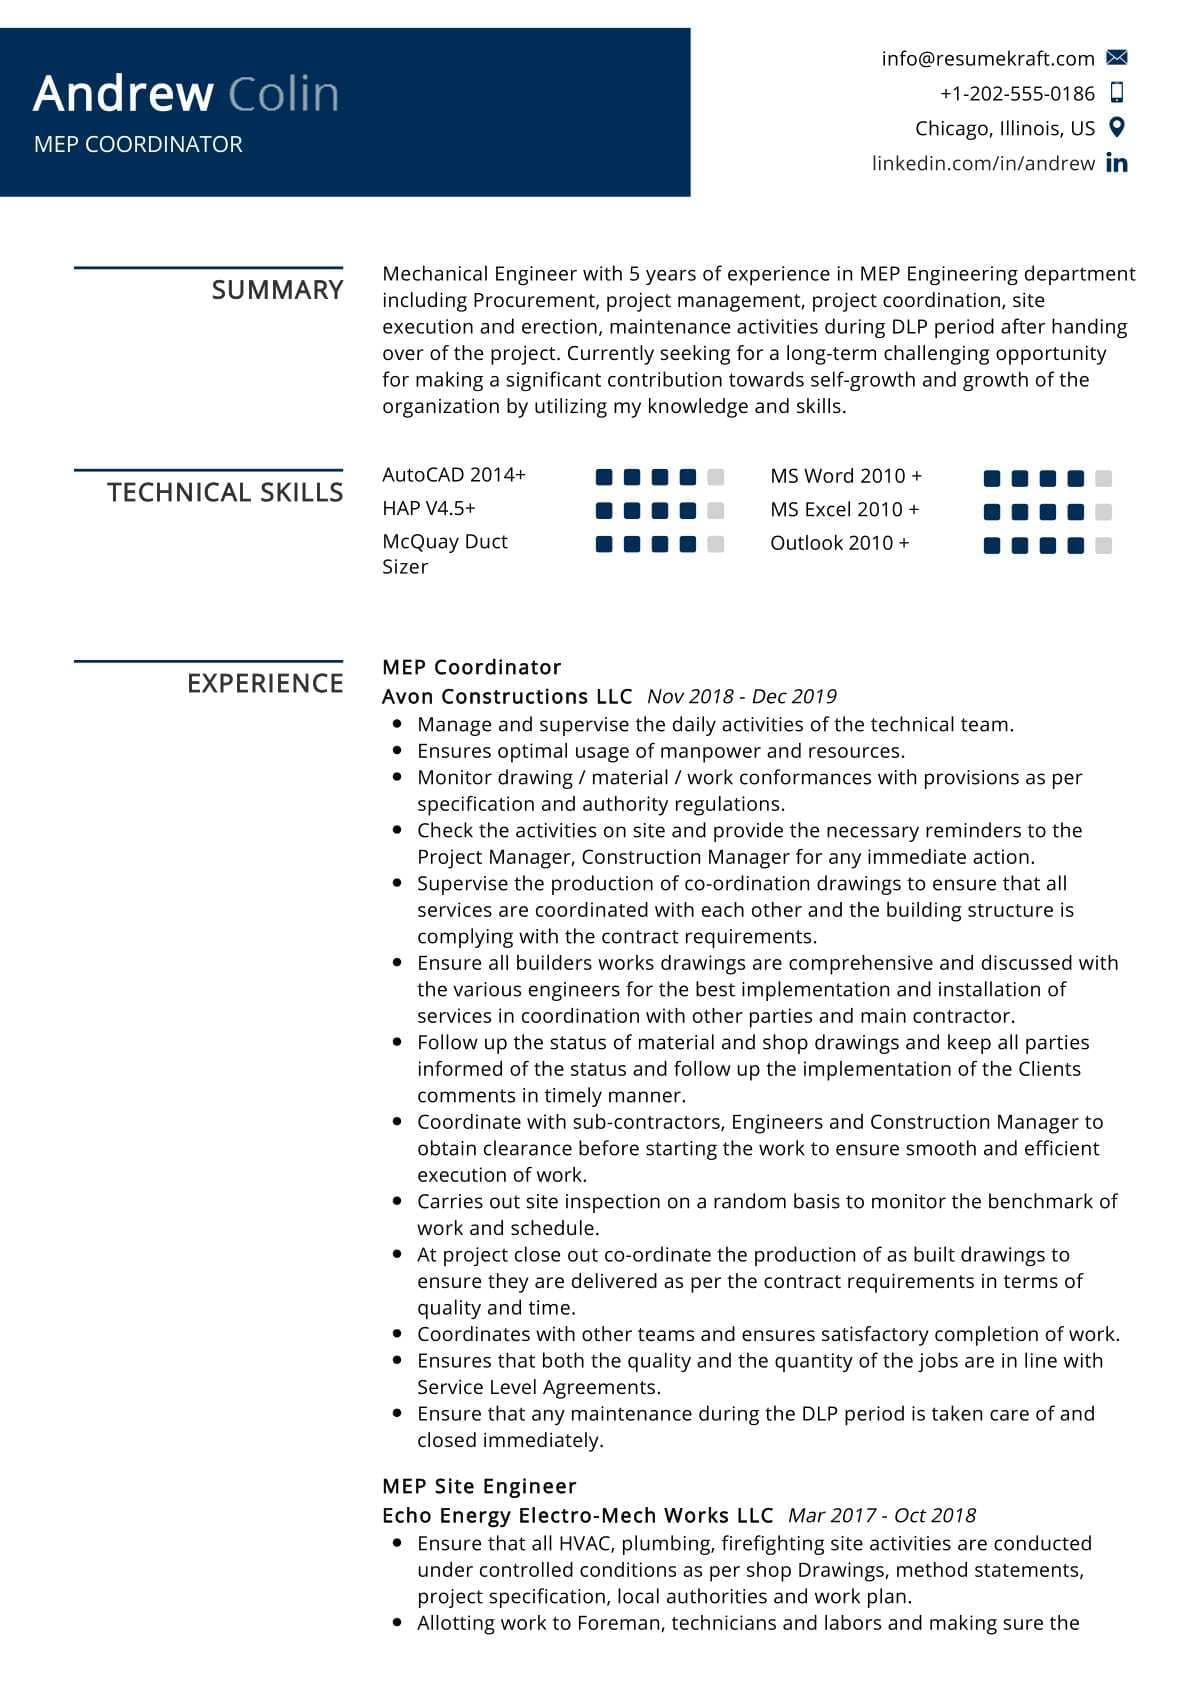 MEP Coordinator Resume Sample